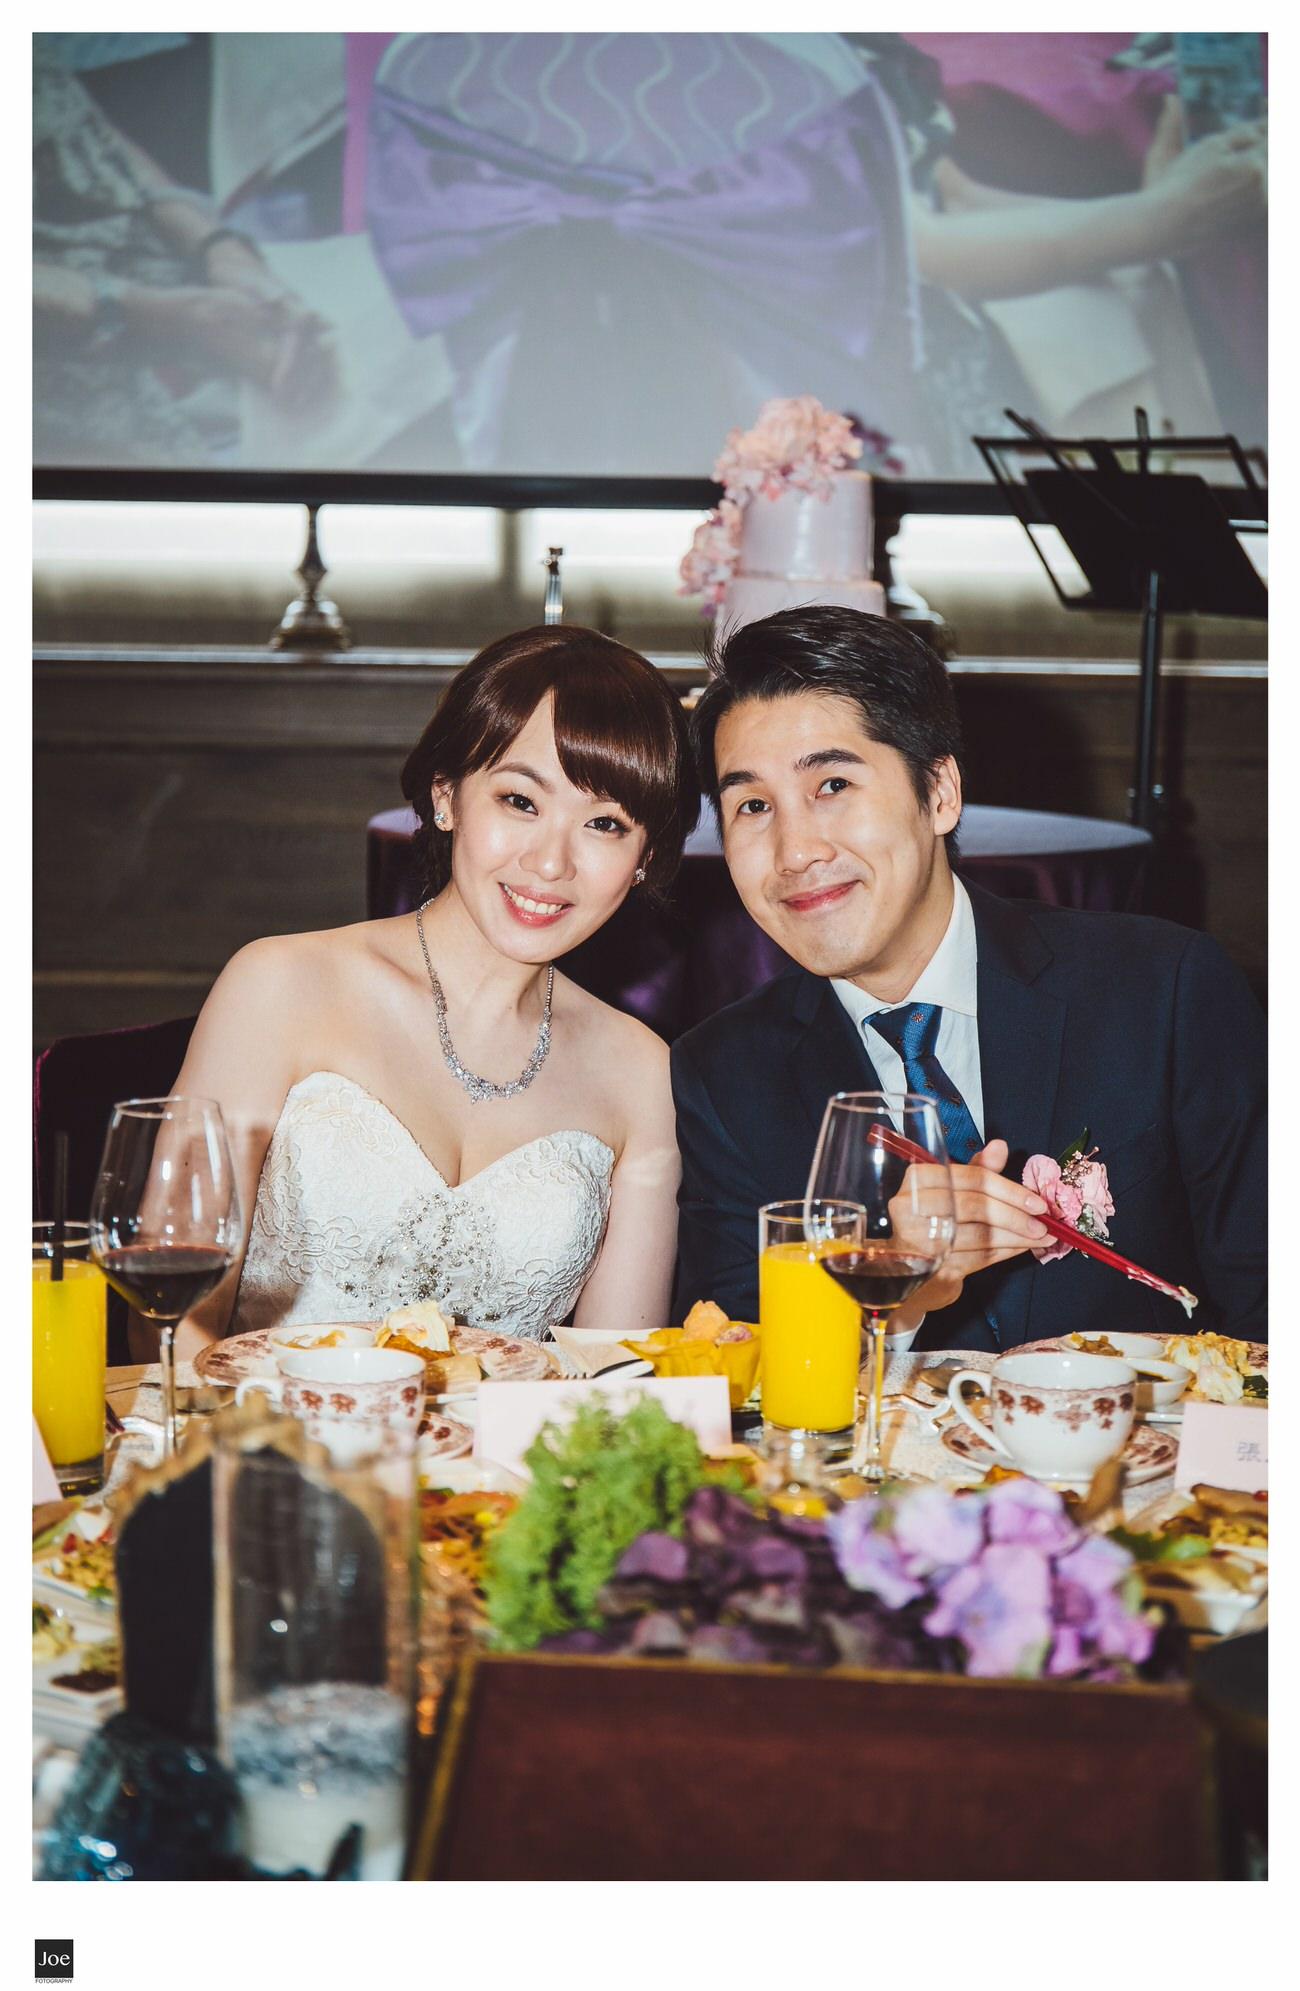 joe-fotography-wedding-photo-palais-de-chine-hotel-035.jpg